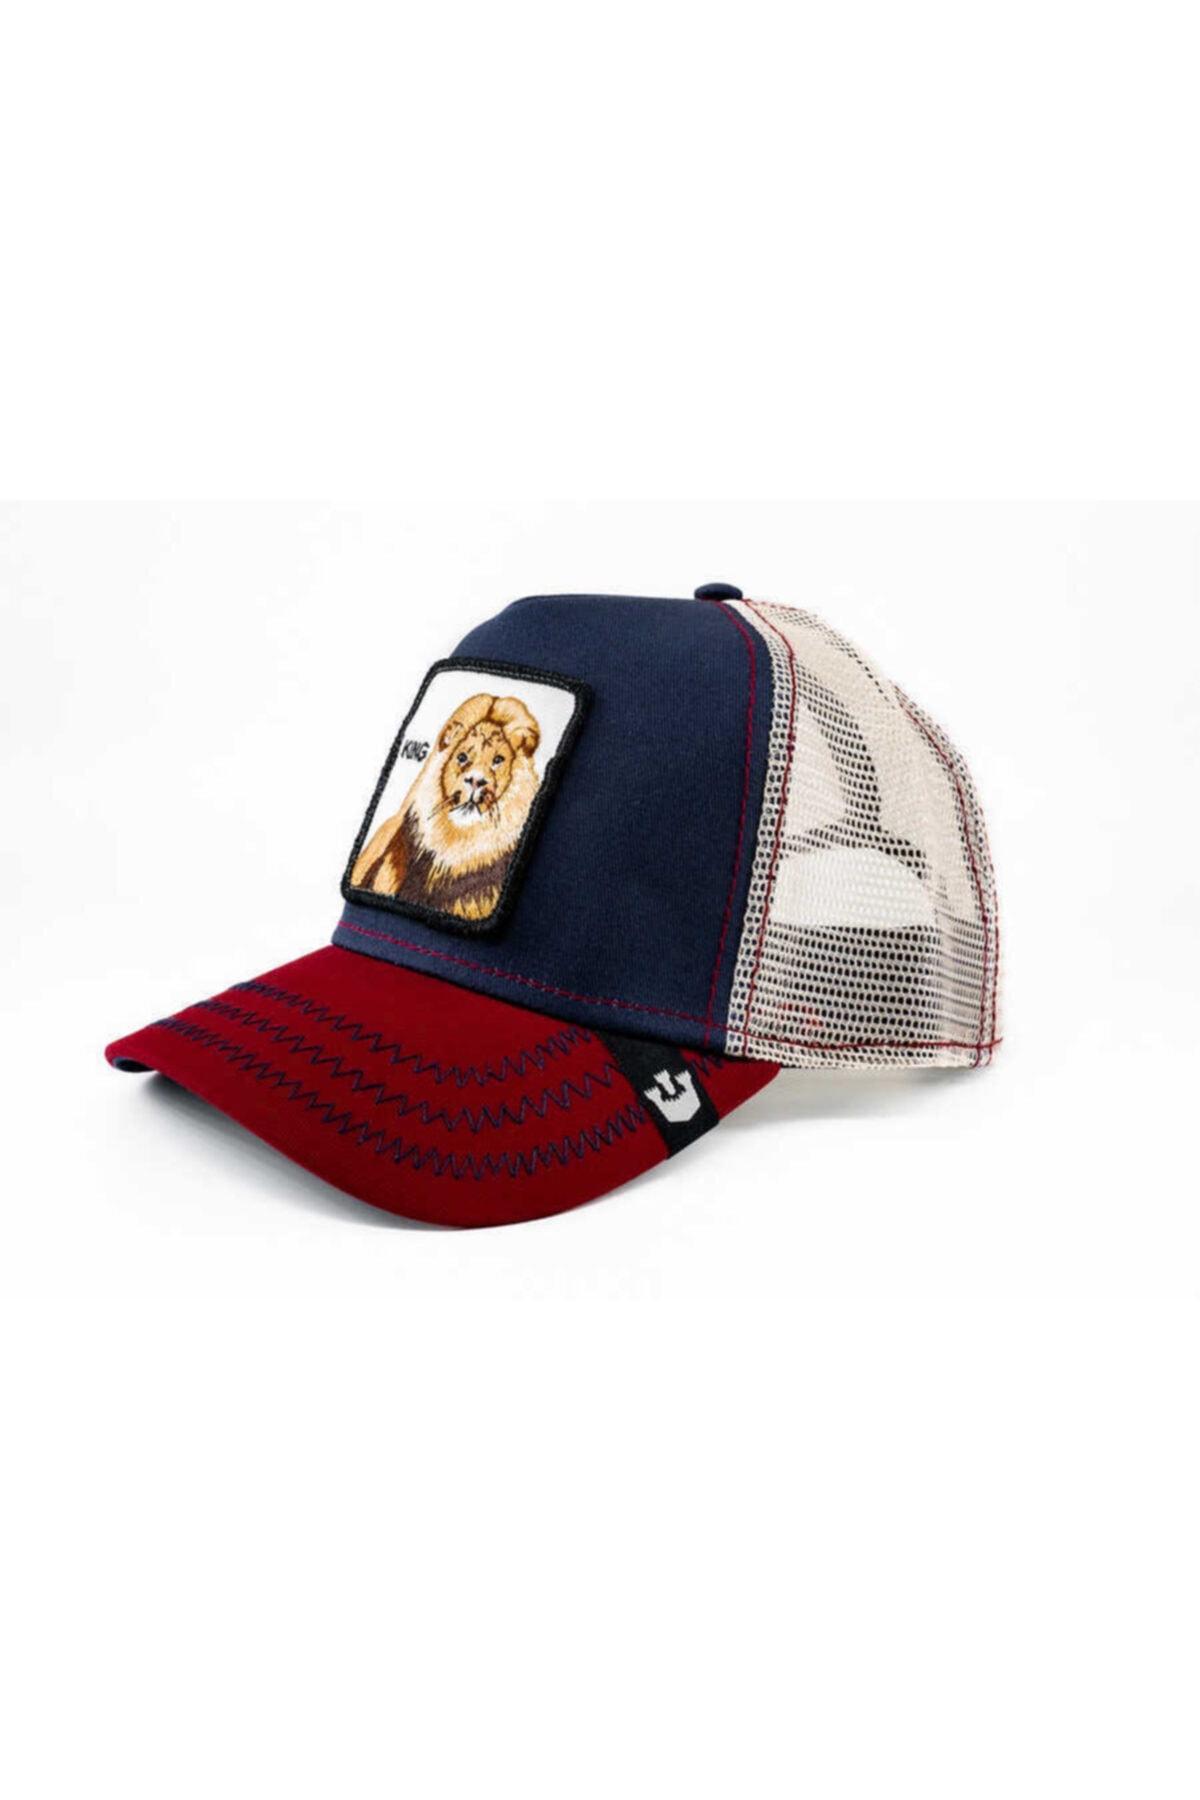 Goorin Bros Unisex Lacivert Big Rock Standart Şapka 101-0564 2